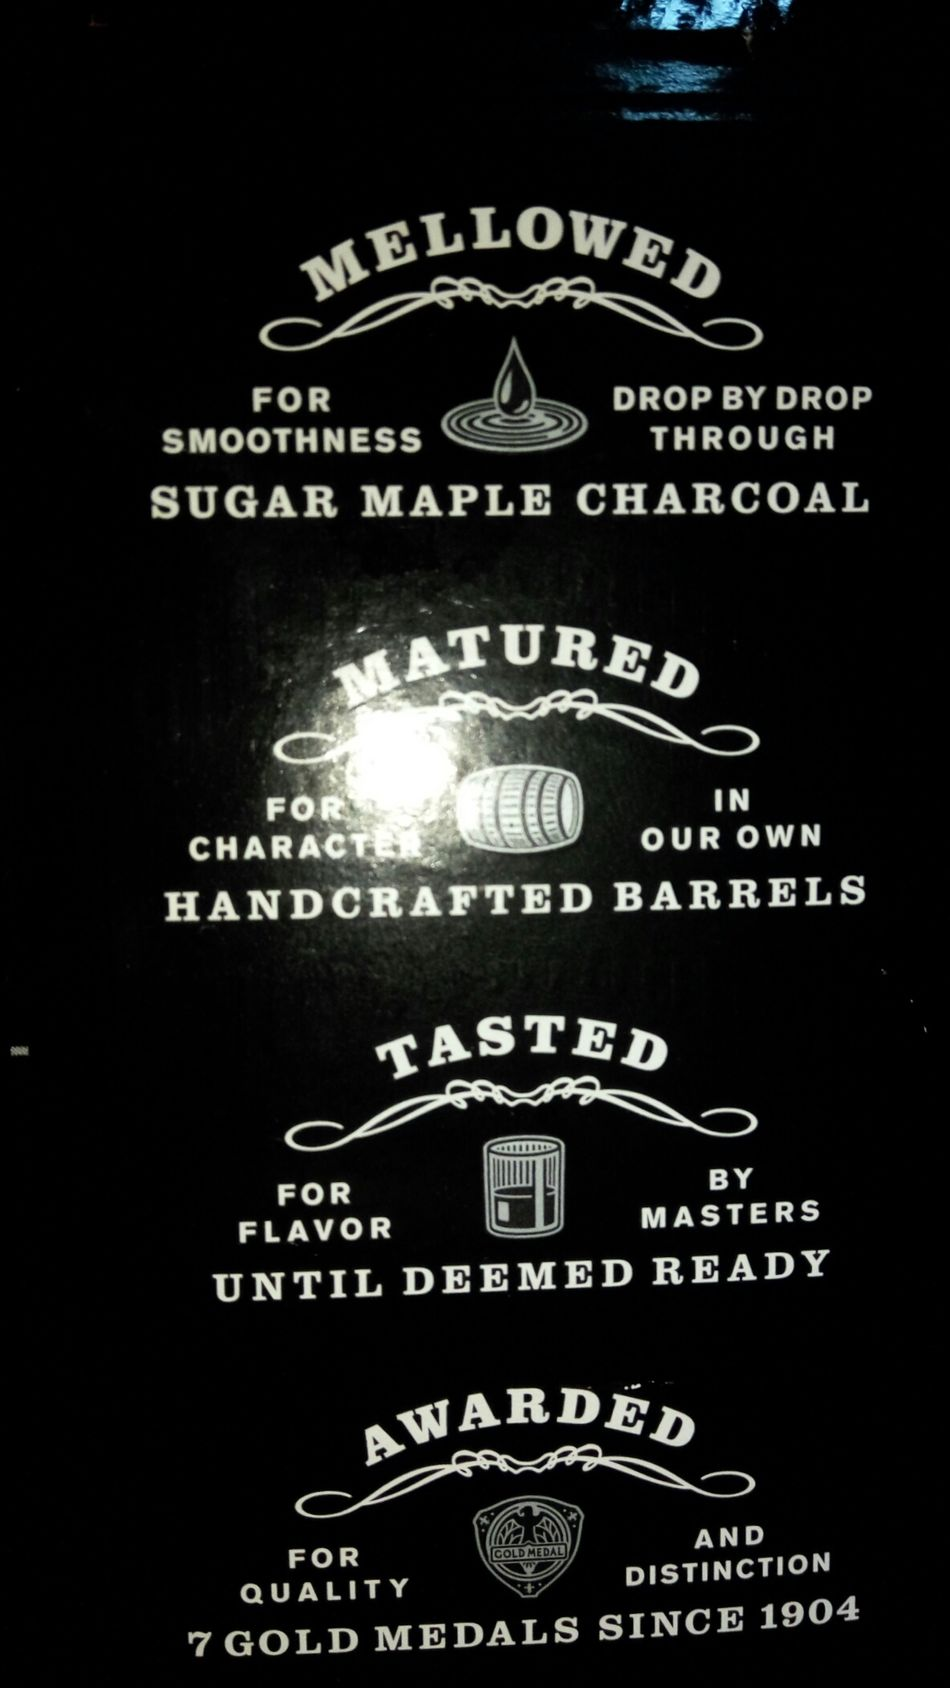 Jack daniels... JD Jackdaniels Jack Daniels Whiskey Bottle Ingredients Mellowed Drinks Matured Tasted , London ,